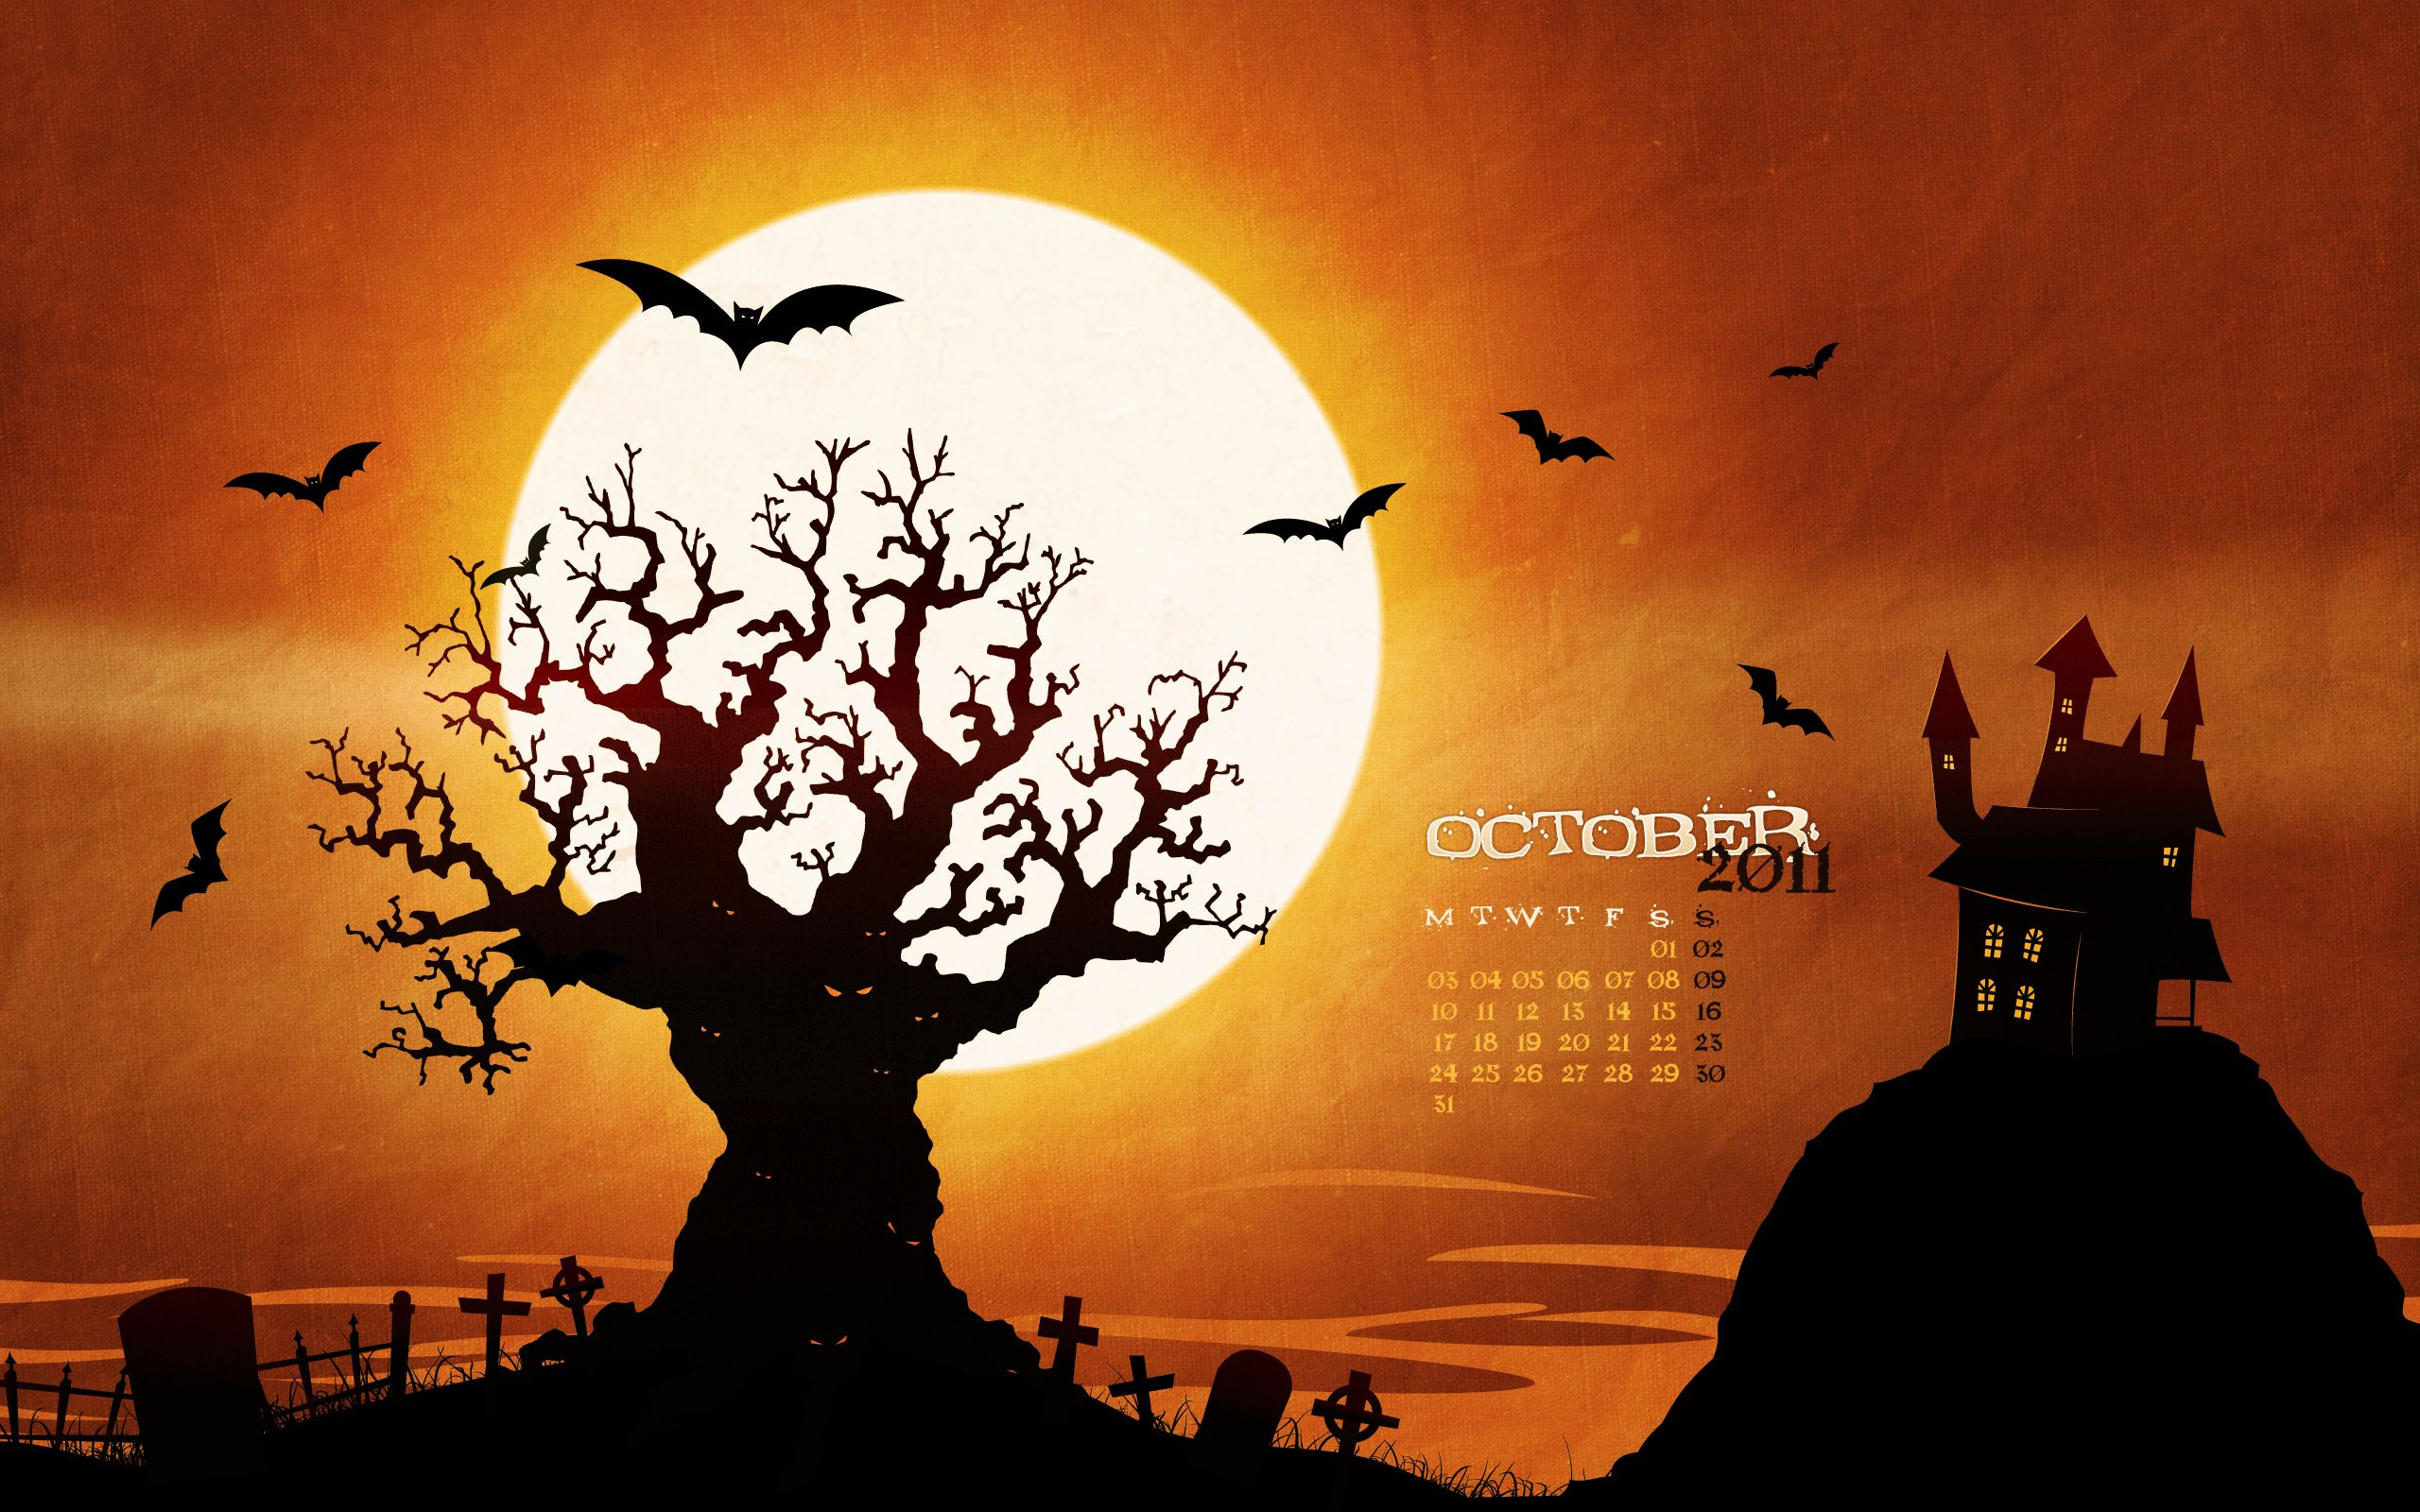 Http Img Wallpaperstock Net 81 Spooky Background Wallpapers 31249 2560x1600 Jpg Halloween Wallpaper Scary Wallpaper Halloween Live Wallpaper